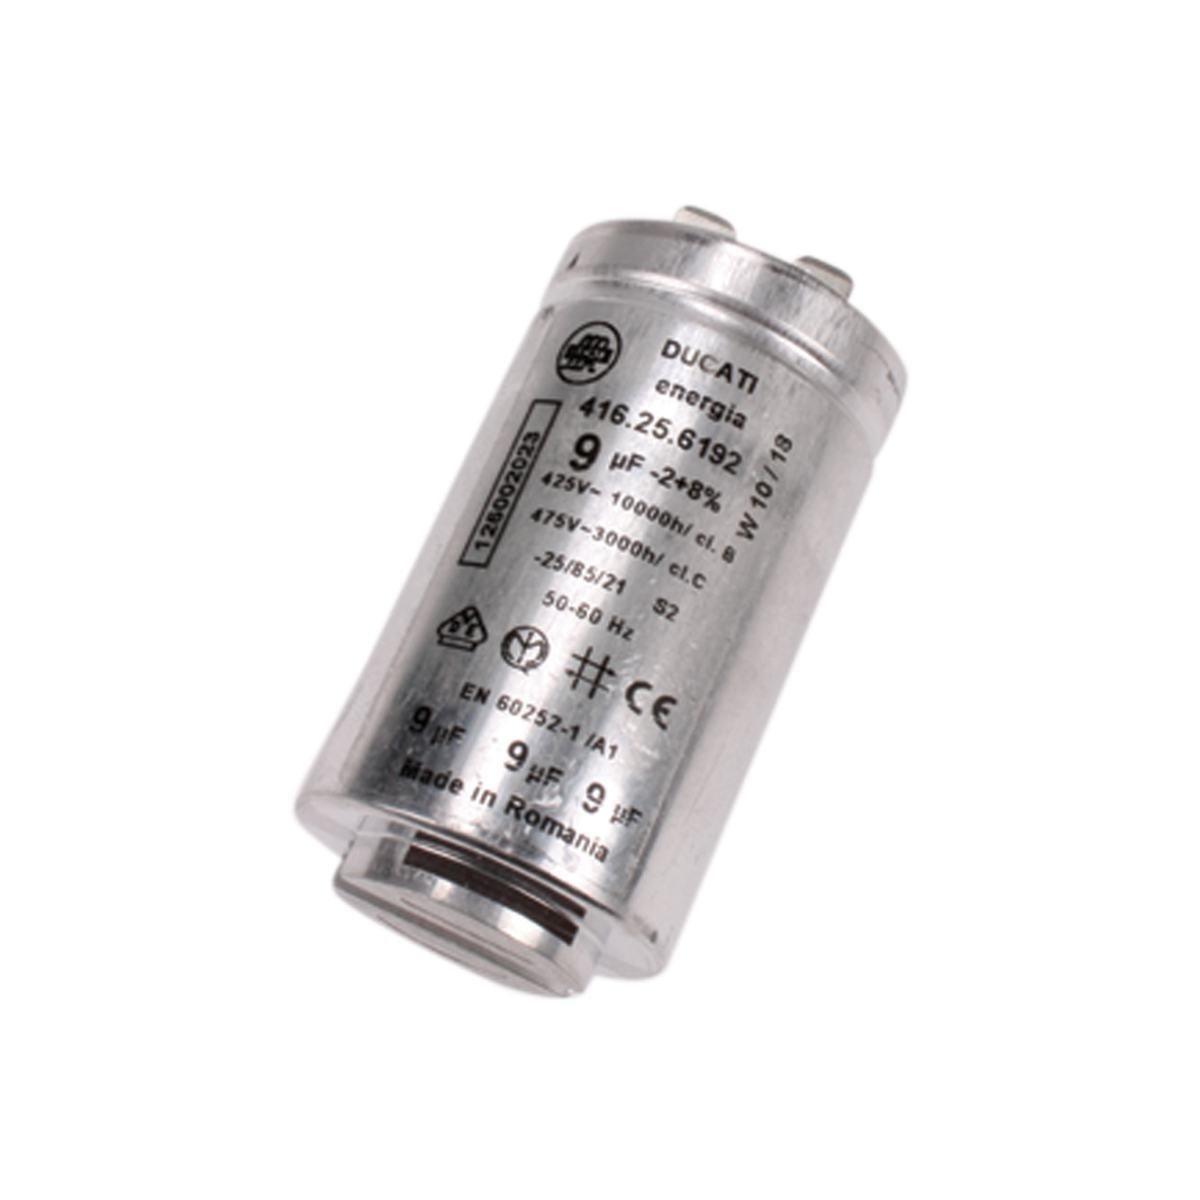 Kondensator 9 MF - Zanussi